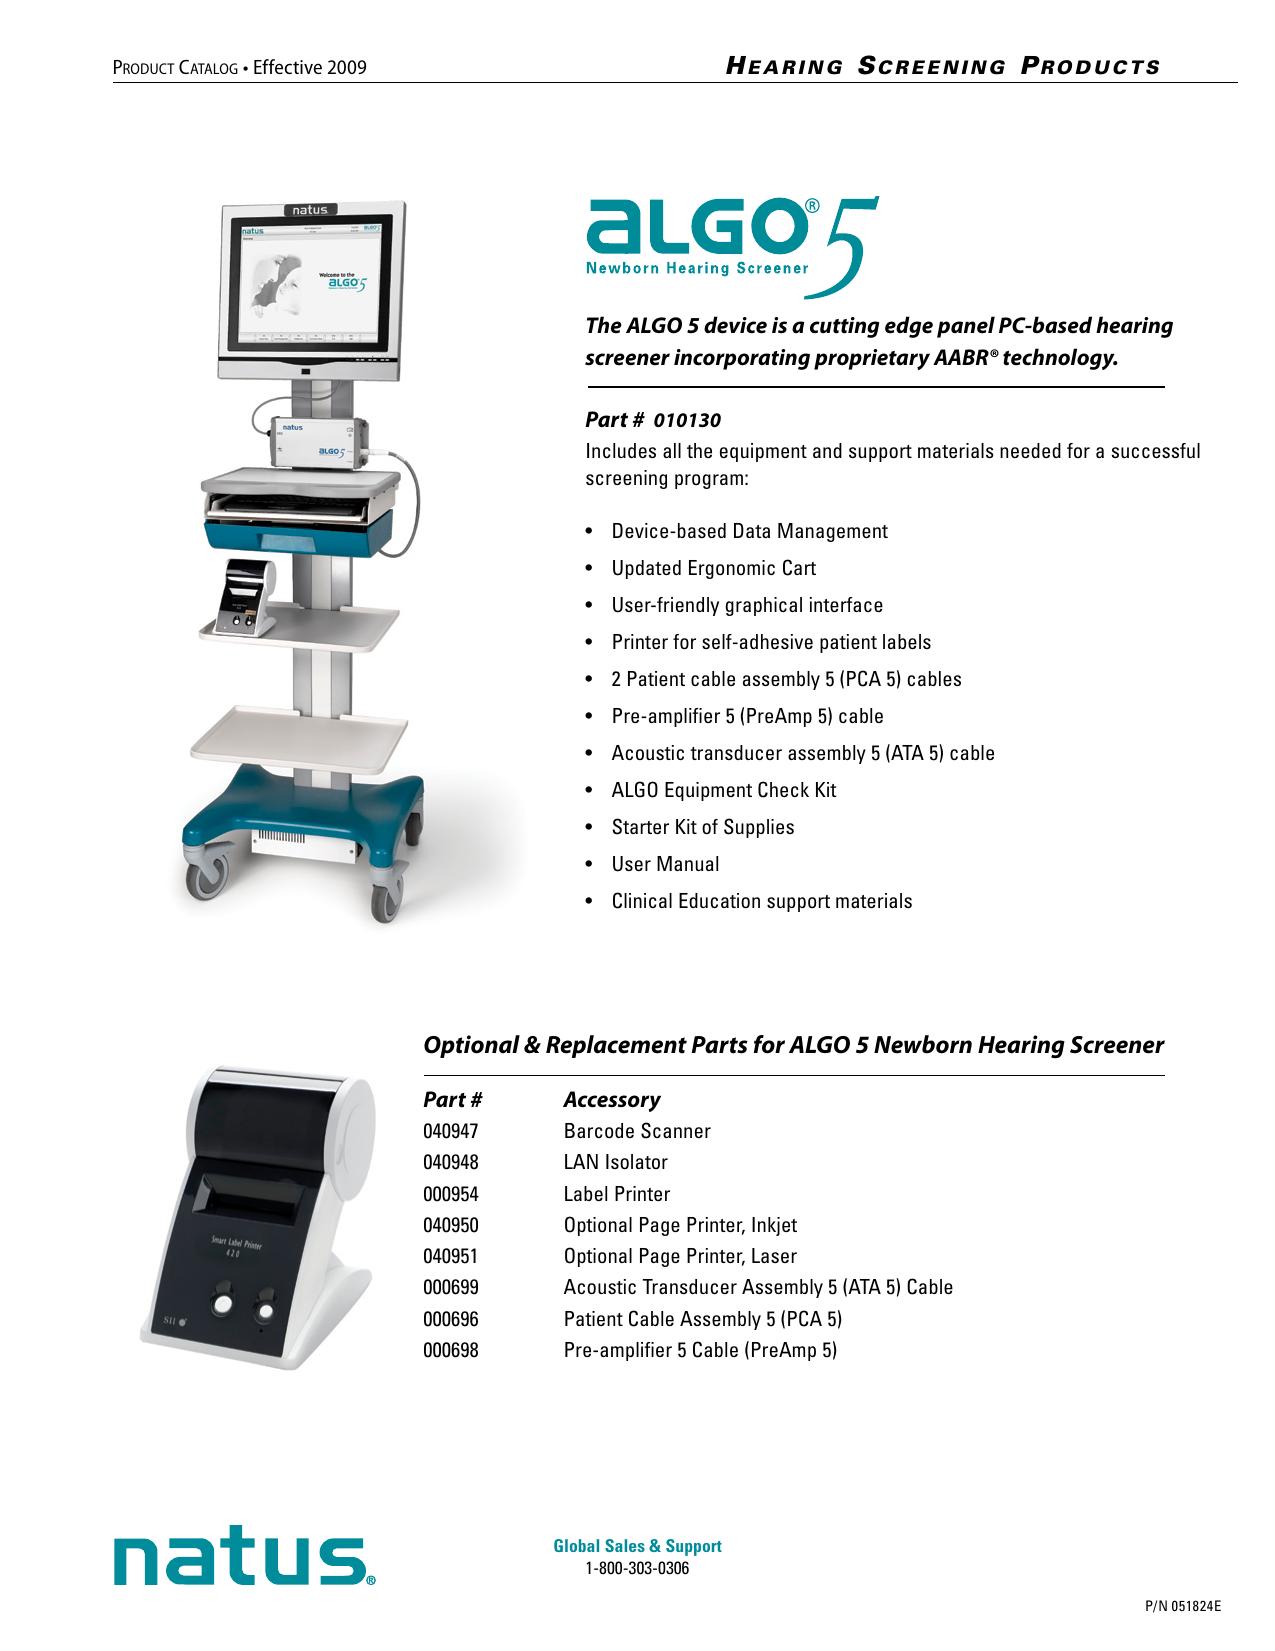 Optional & Replacement Parts for ALGO 5 Newborn Hearing | manualzz com